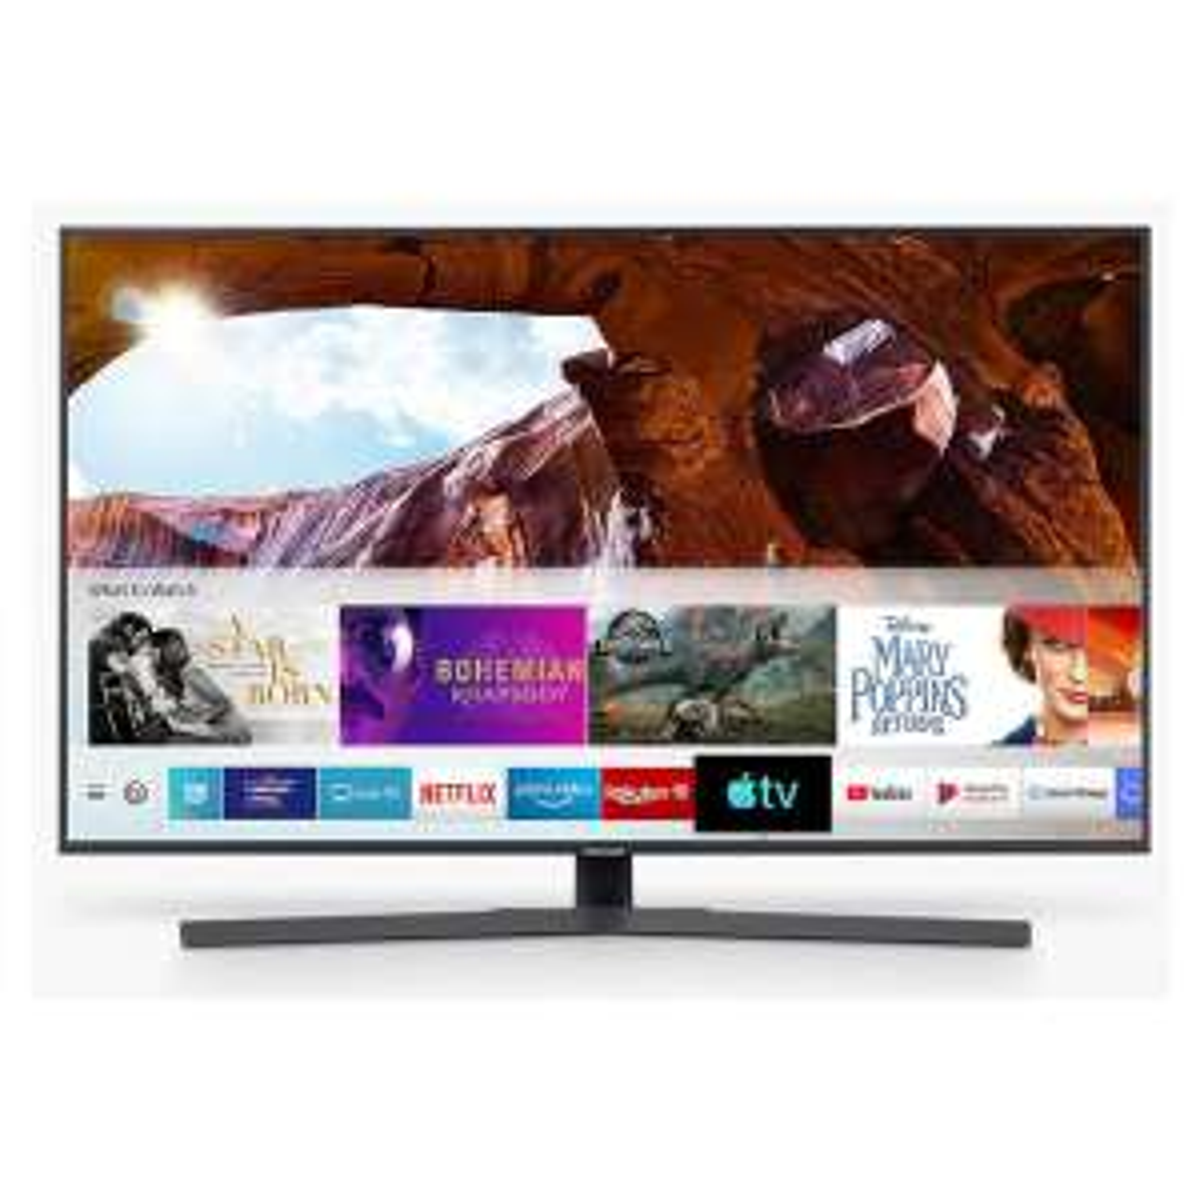 "Samsung UE65RU7400 (2019) HDR 4K Ultra HD Smart TV, 65"" with TVPlus/Freesat HD & Apple TV App, Titan Gray £629 BT Shop"